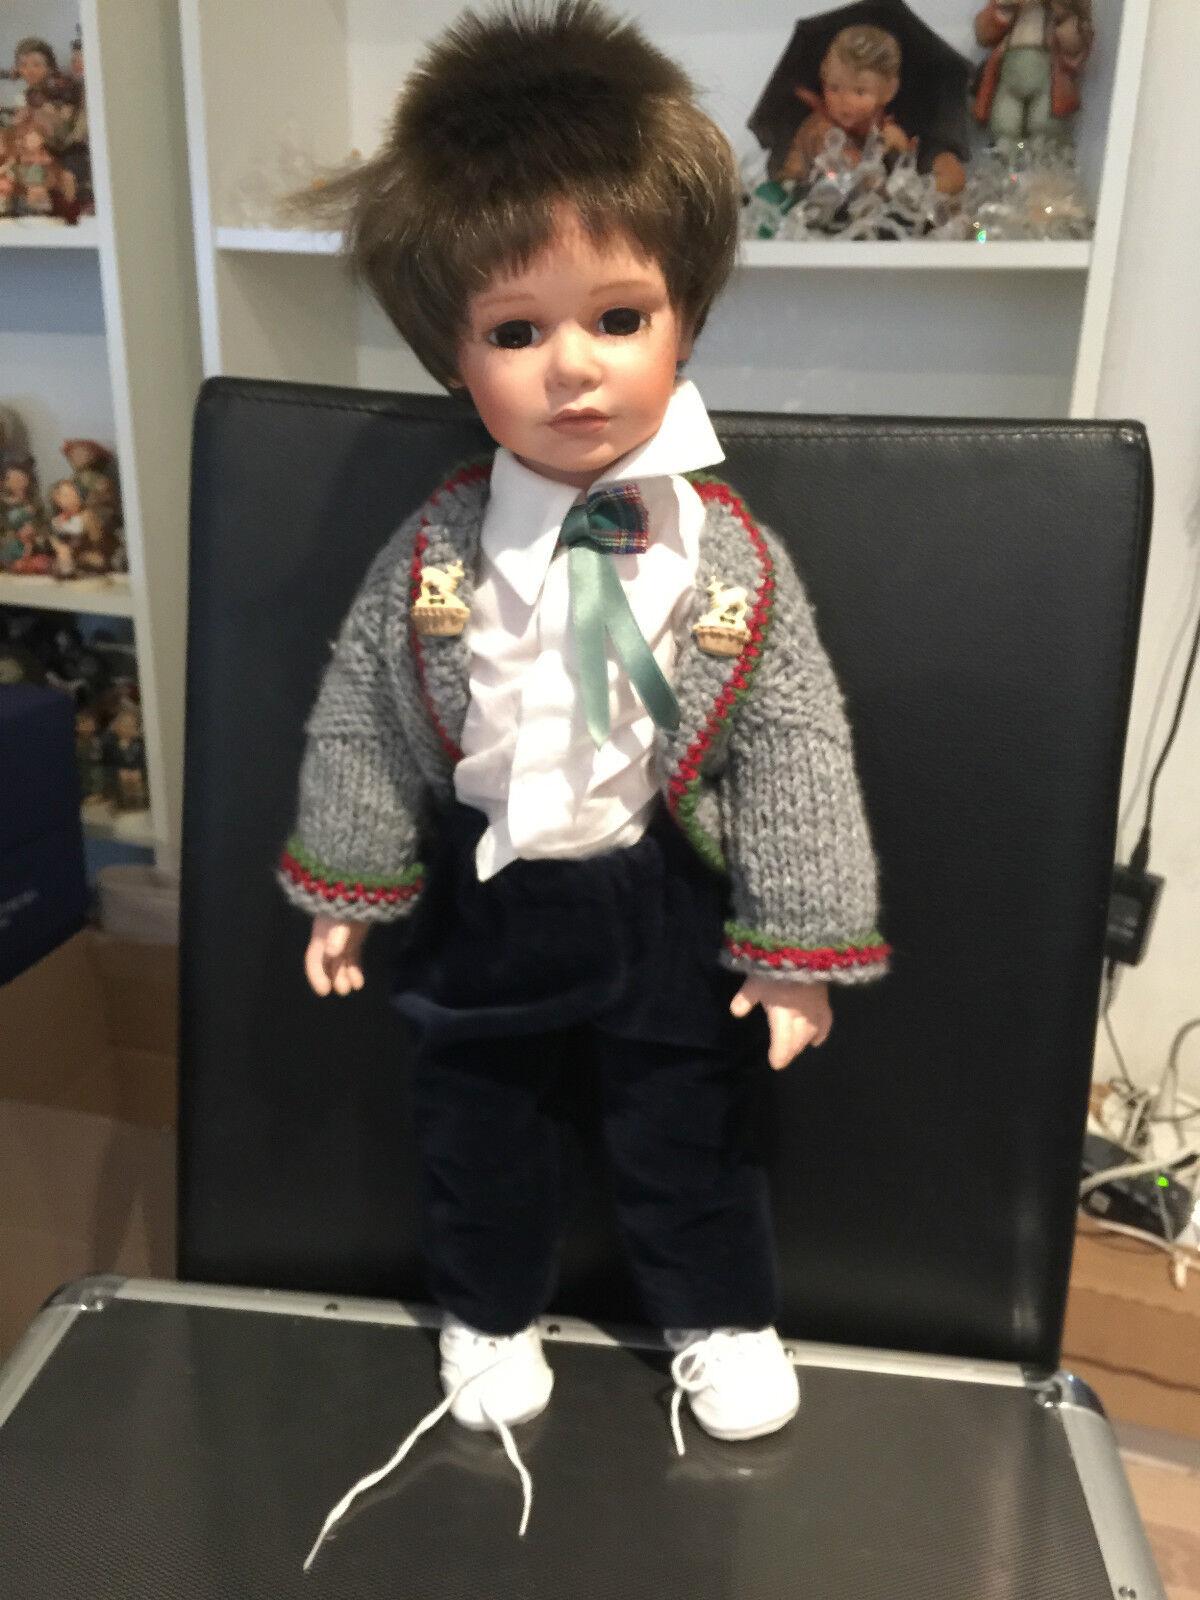 Rose Marie Kunz muñeca articular muñeca 50 cm (((buen estado)))